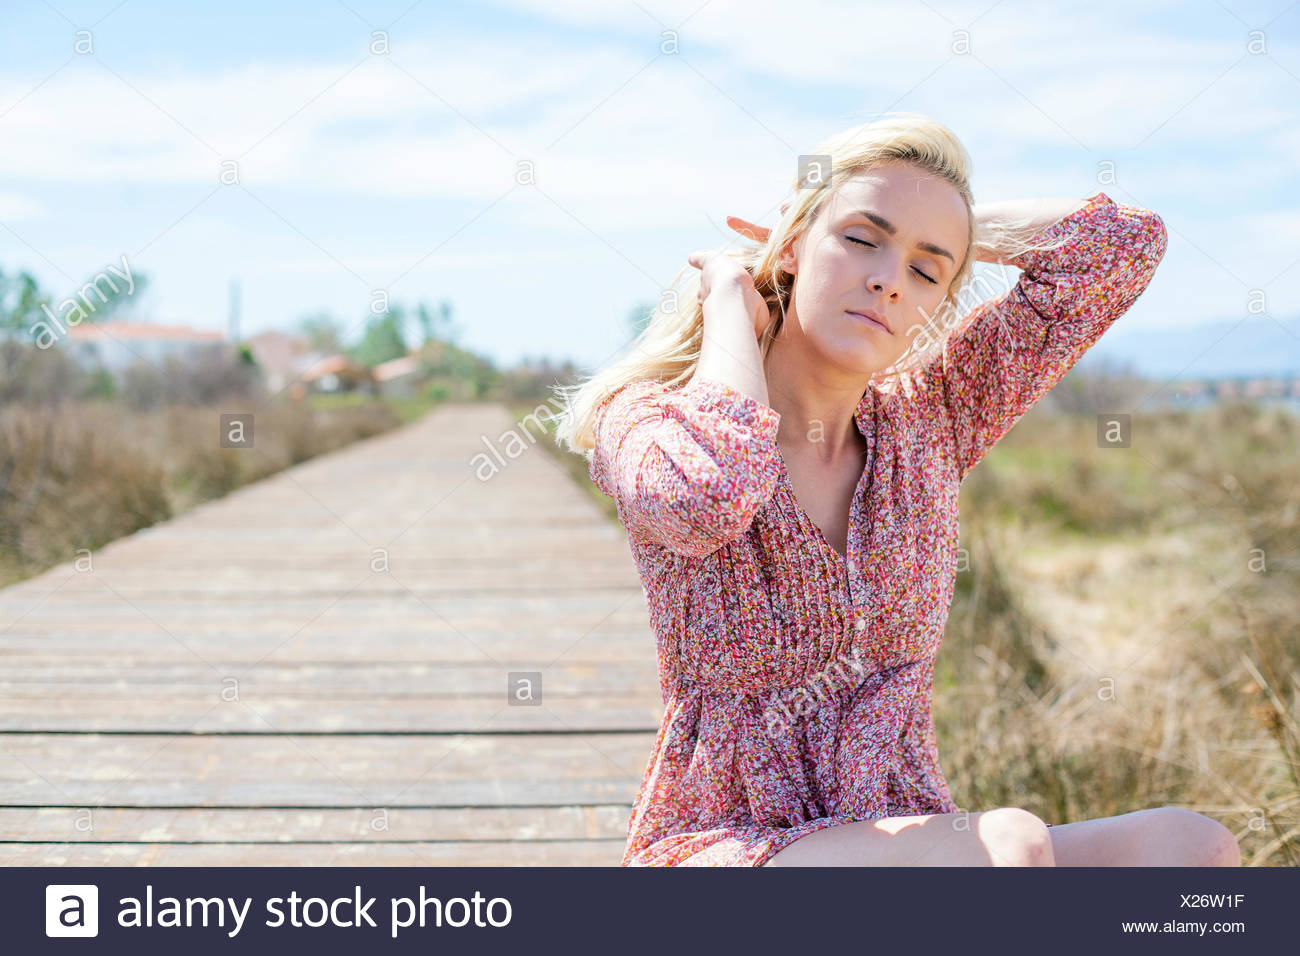 Junge Frau sitzt auf Promenade Augen geschlossen Stockbild